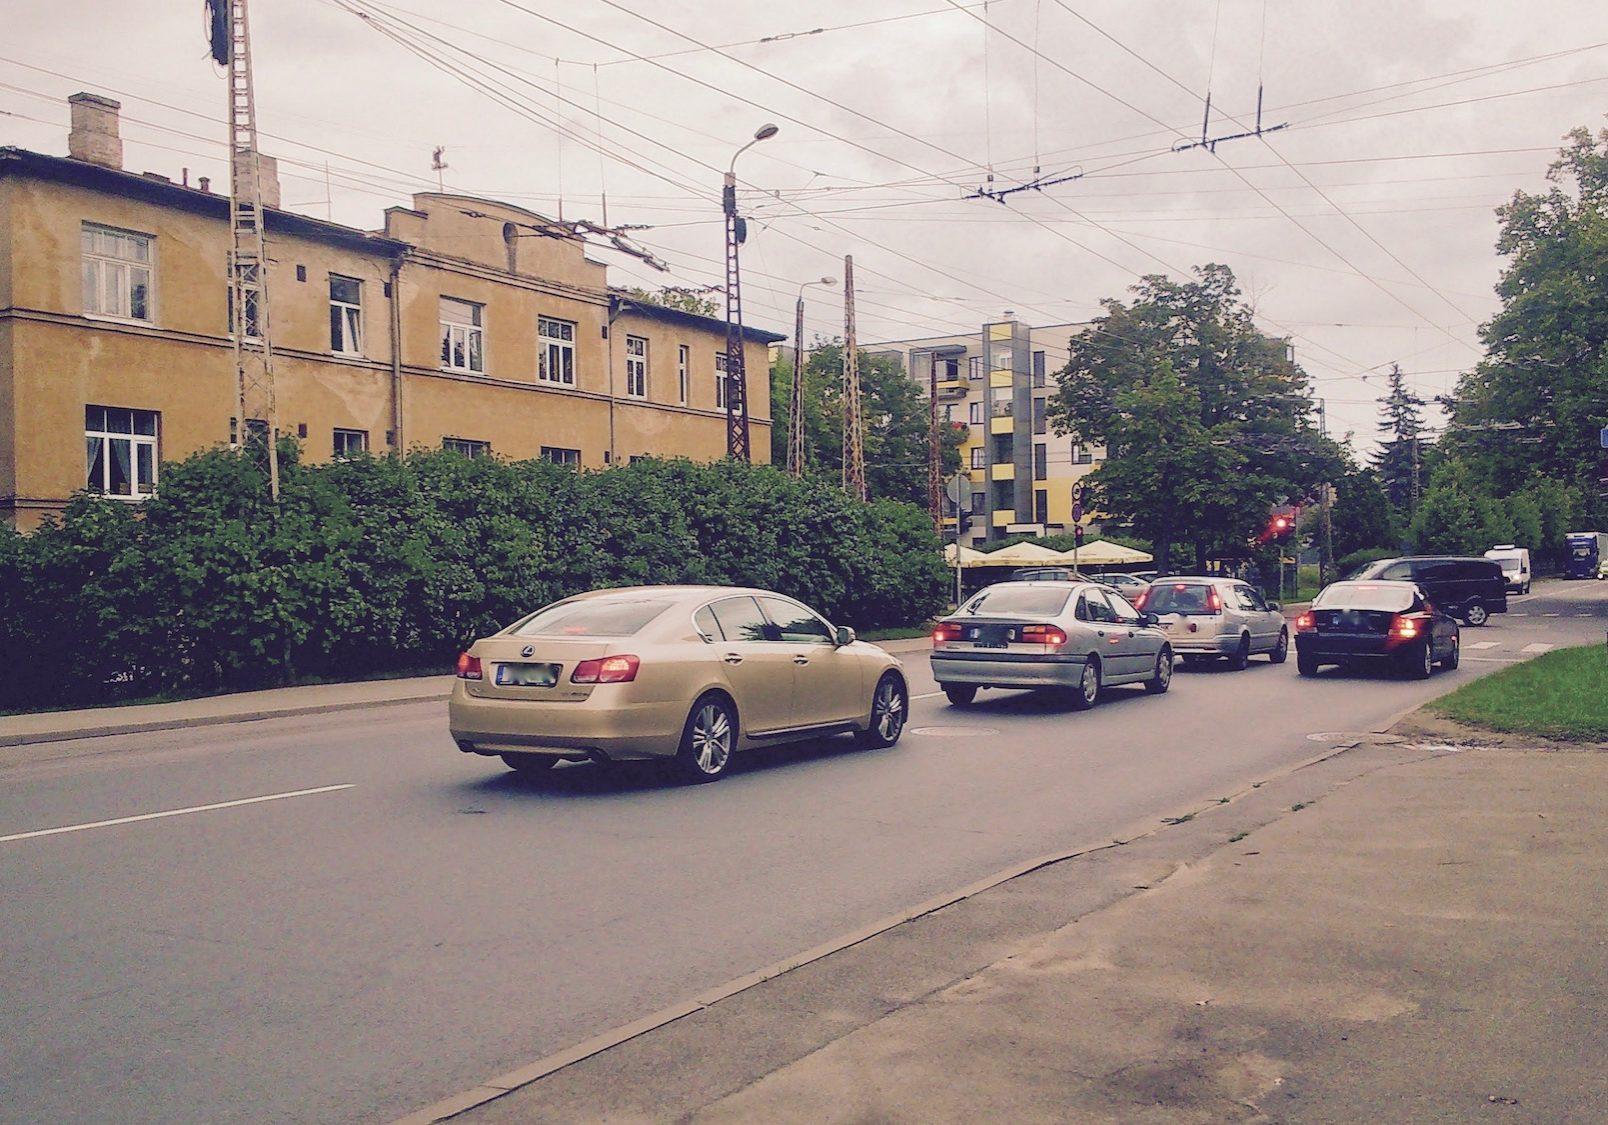 Biķernieku Street is a great location